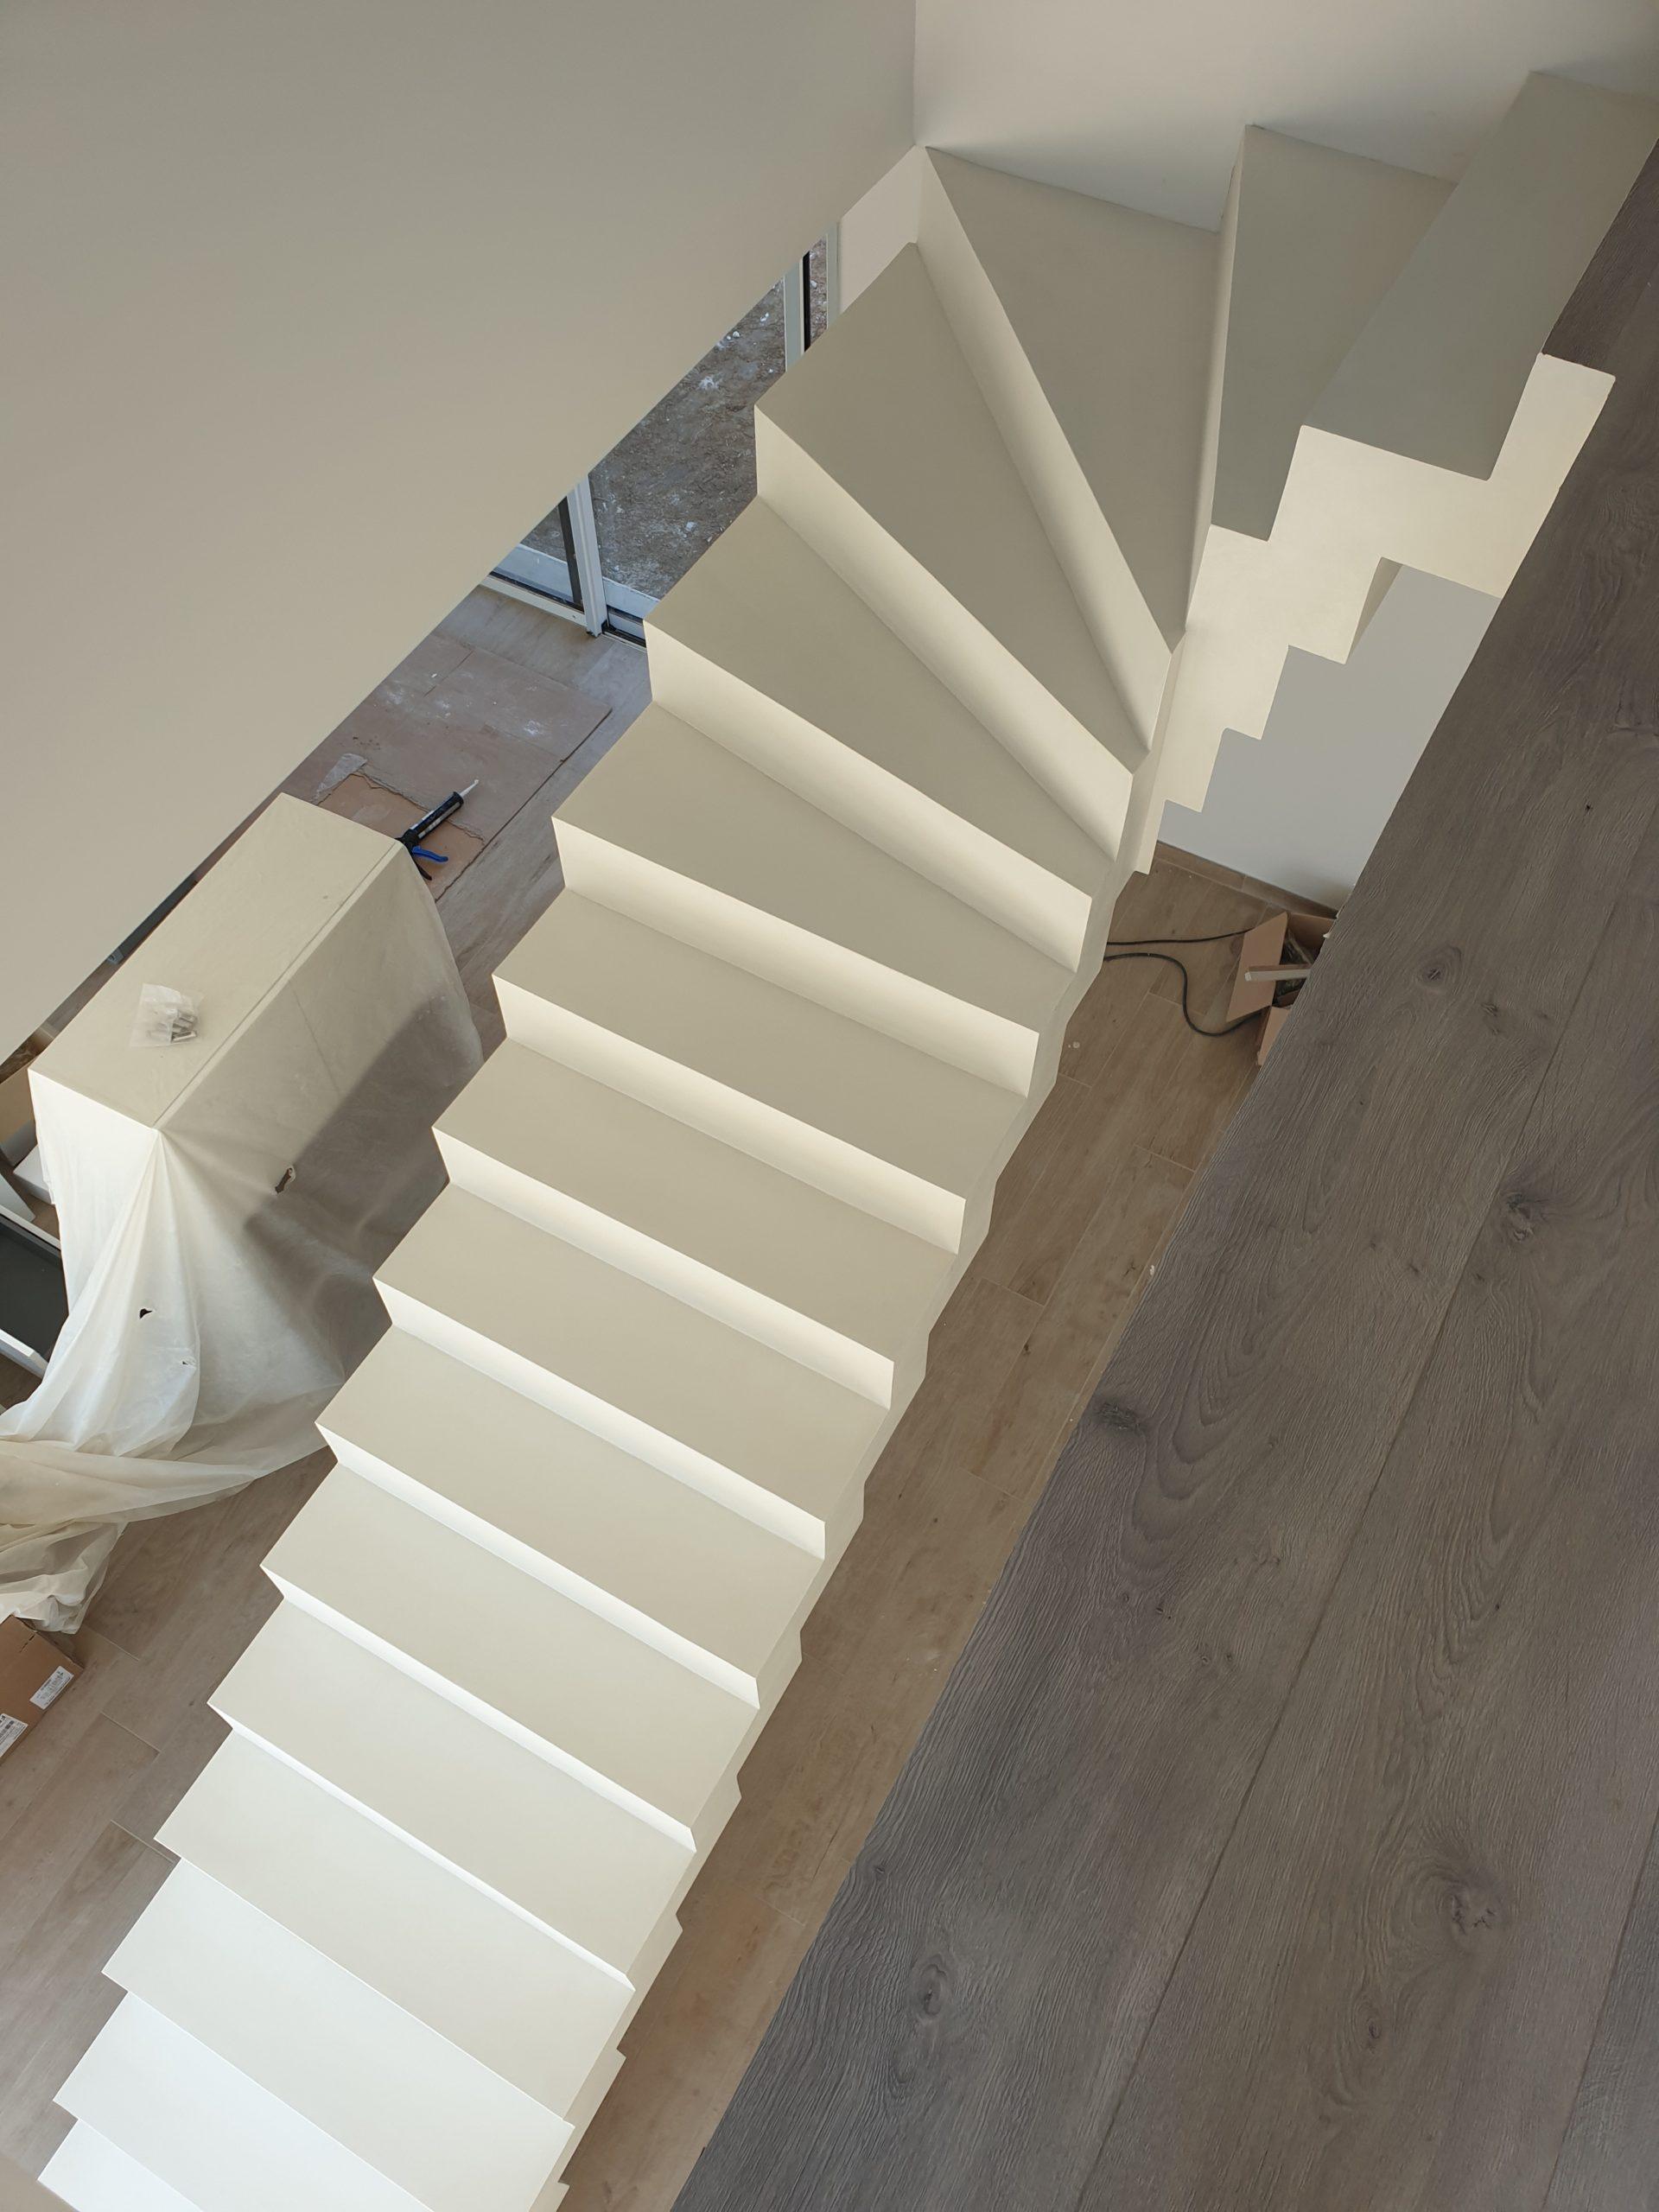 Escalier beton tournant en haut